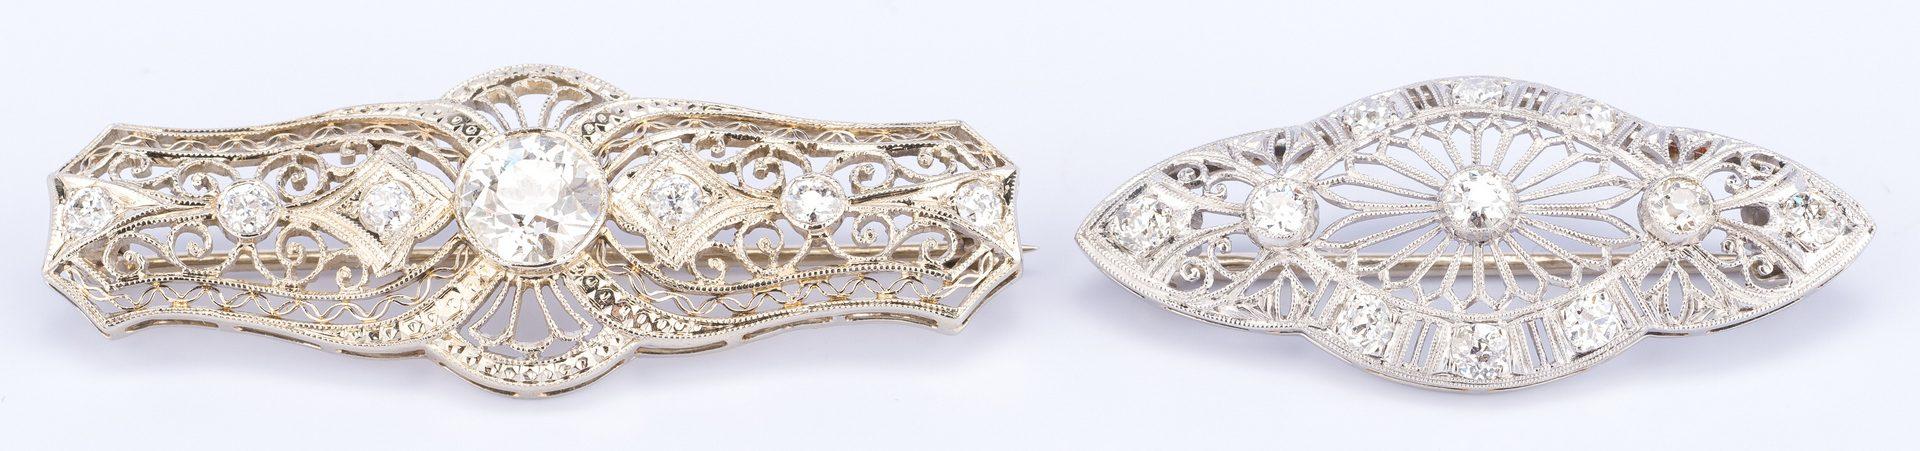 Lot 392: 2 Edwardian Pins, 1 w/ 1.50 ct OMC center diamond